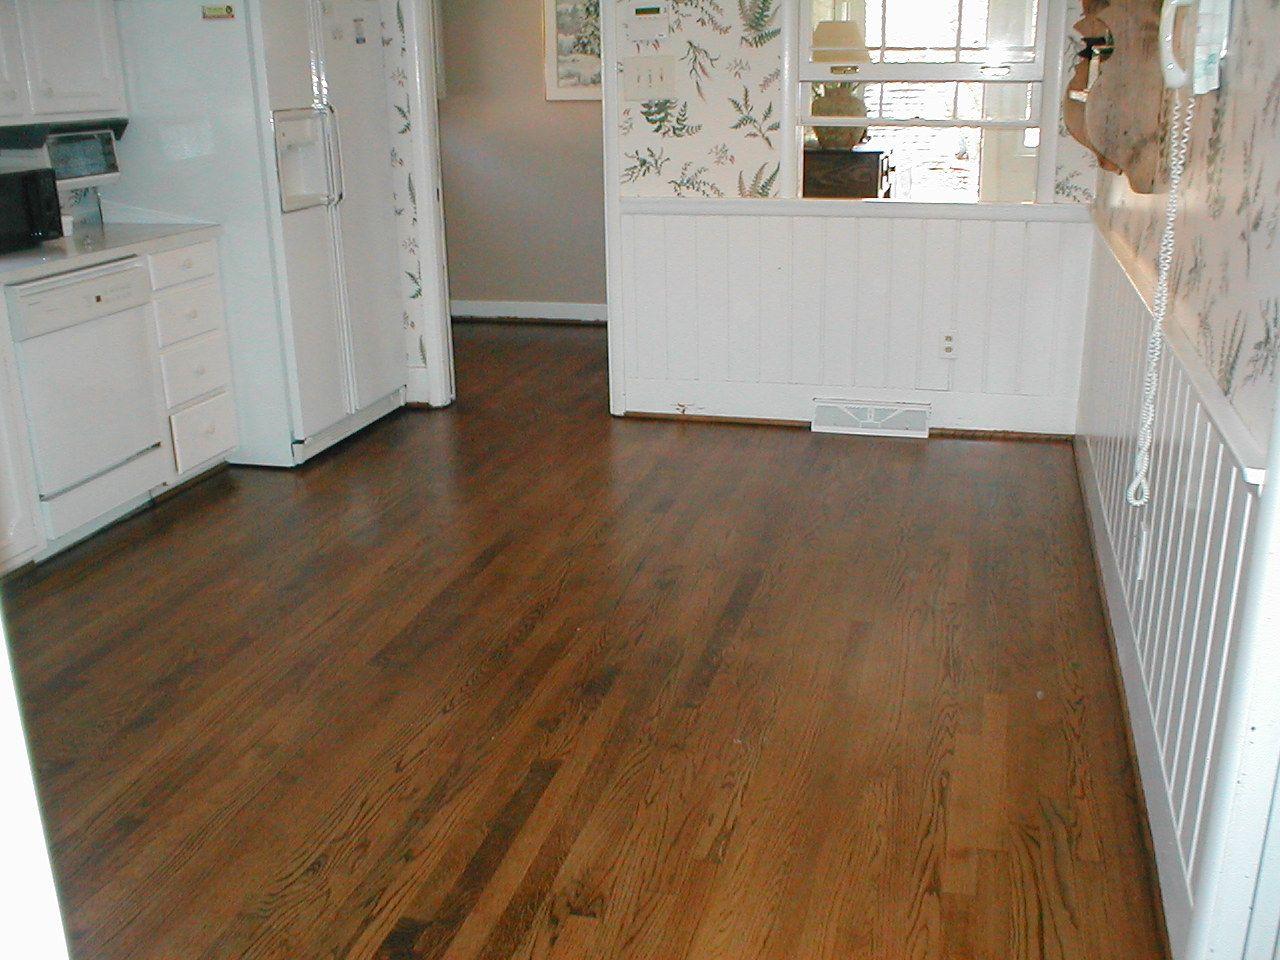 refinishing wood floors contractors Refinish wood floors